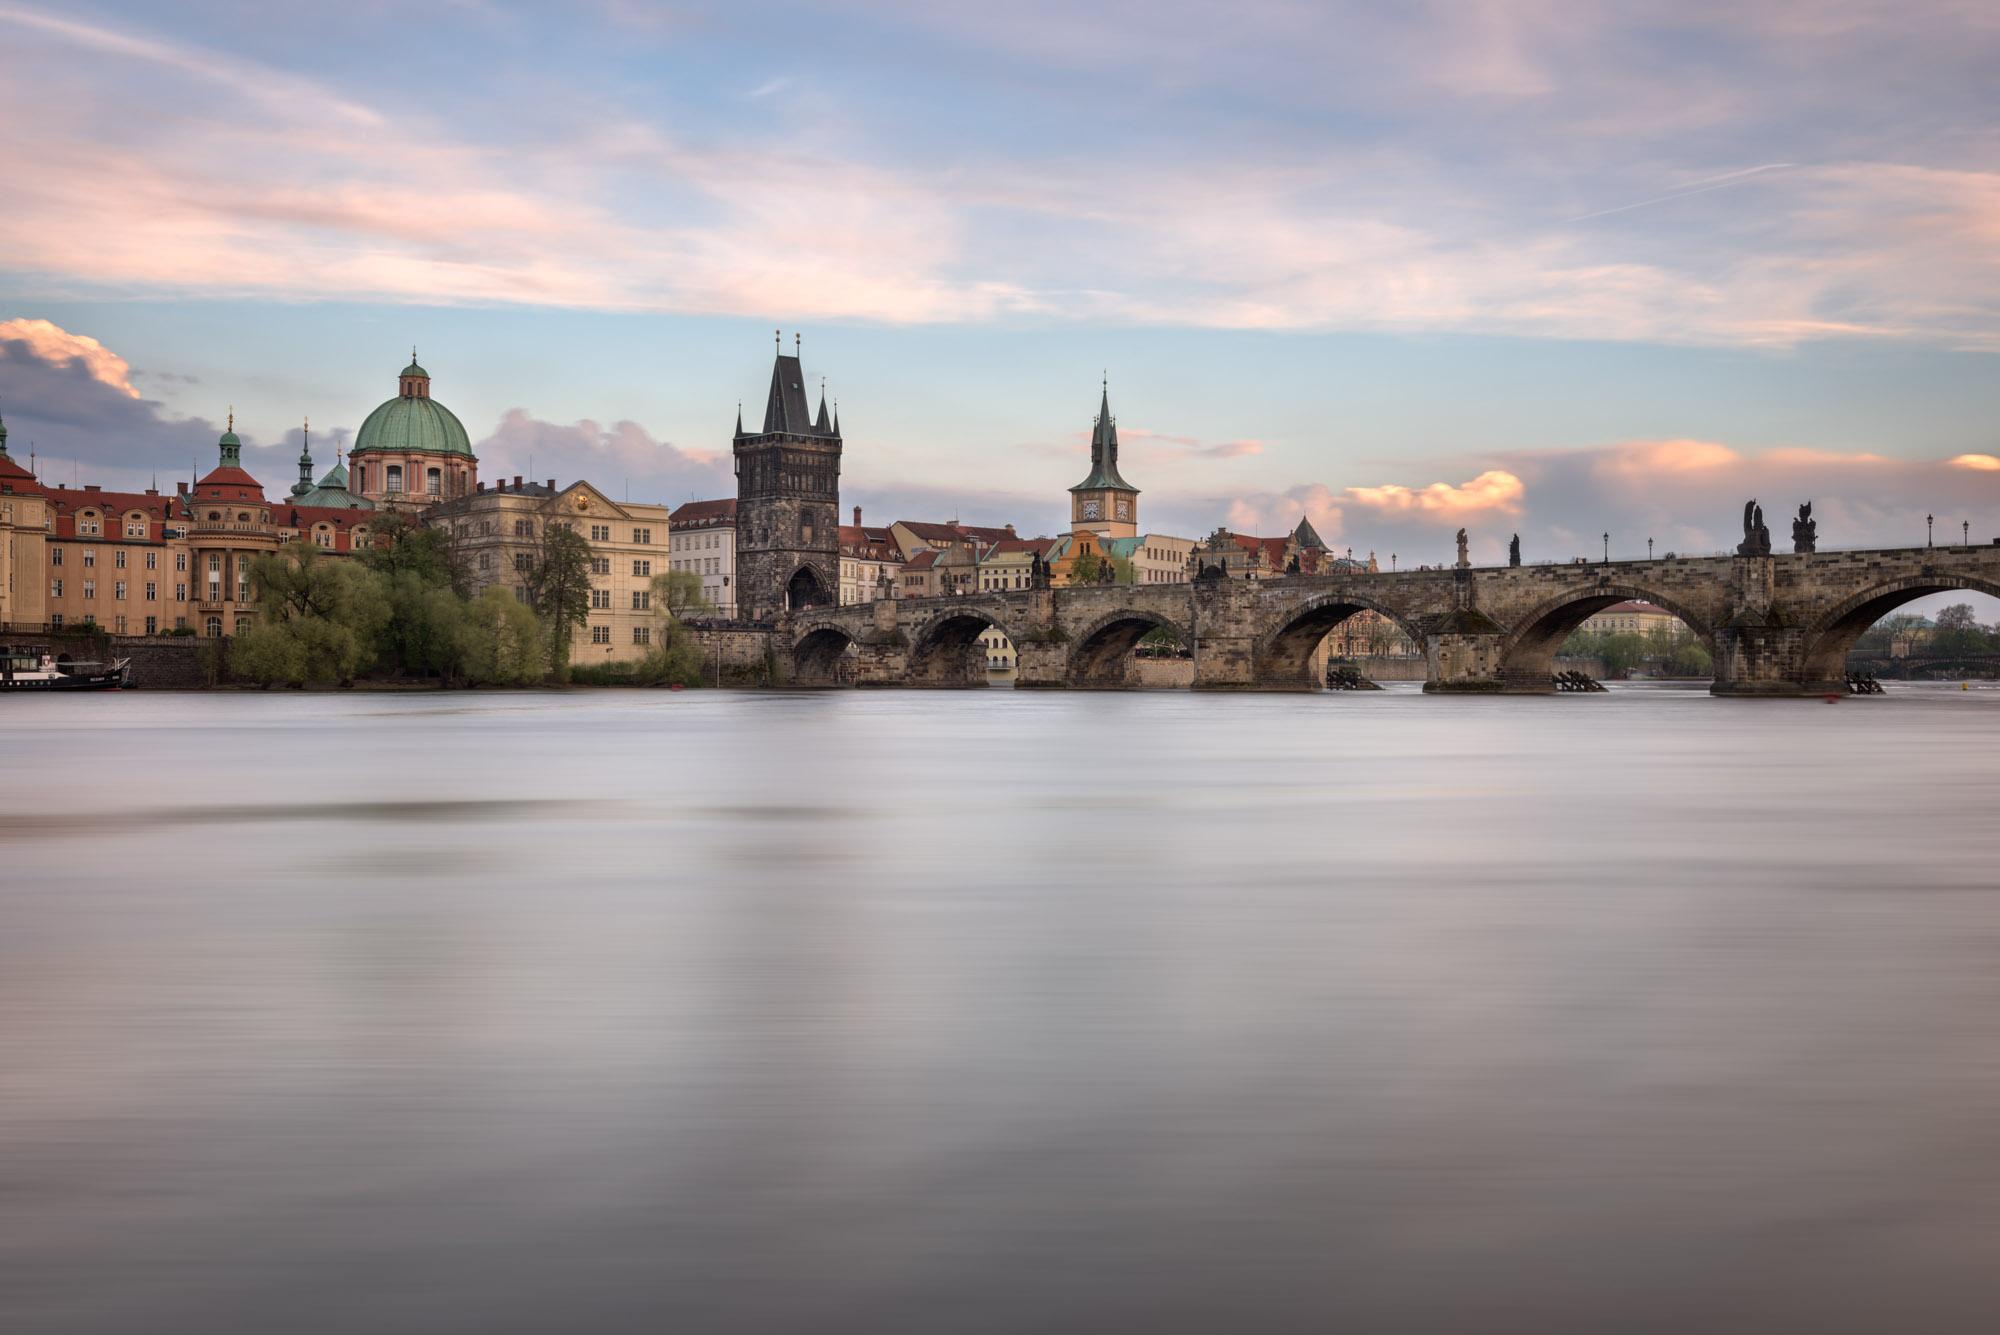 Vltava River, Charles Bridge, Prague, Czech Republic